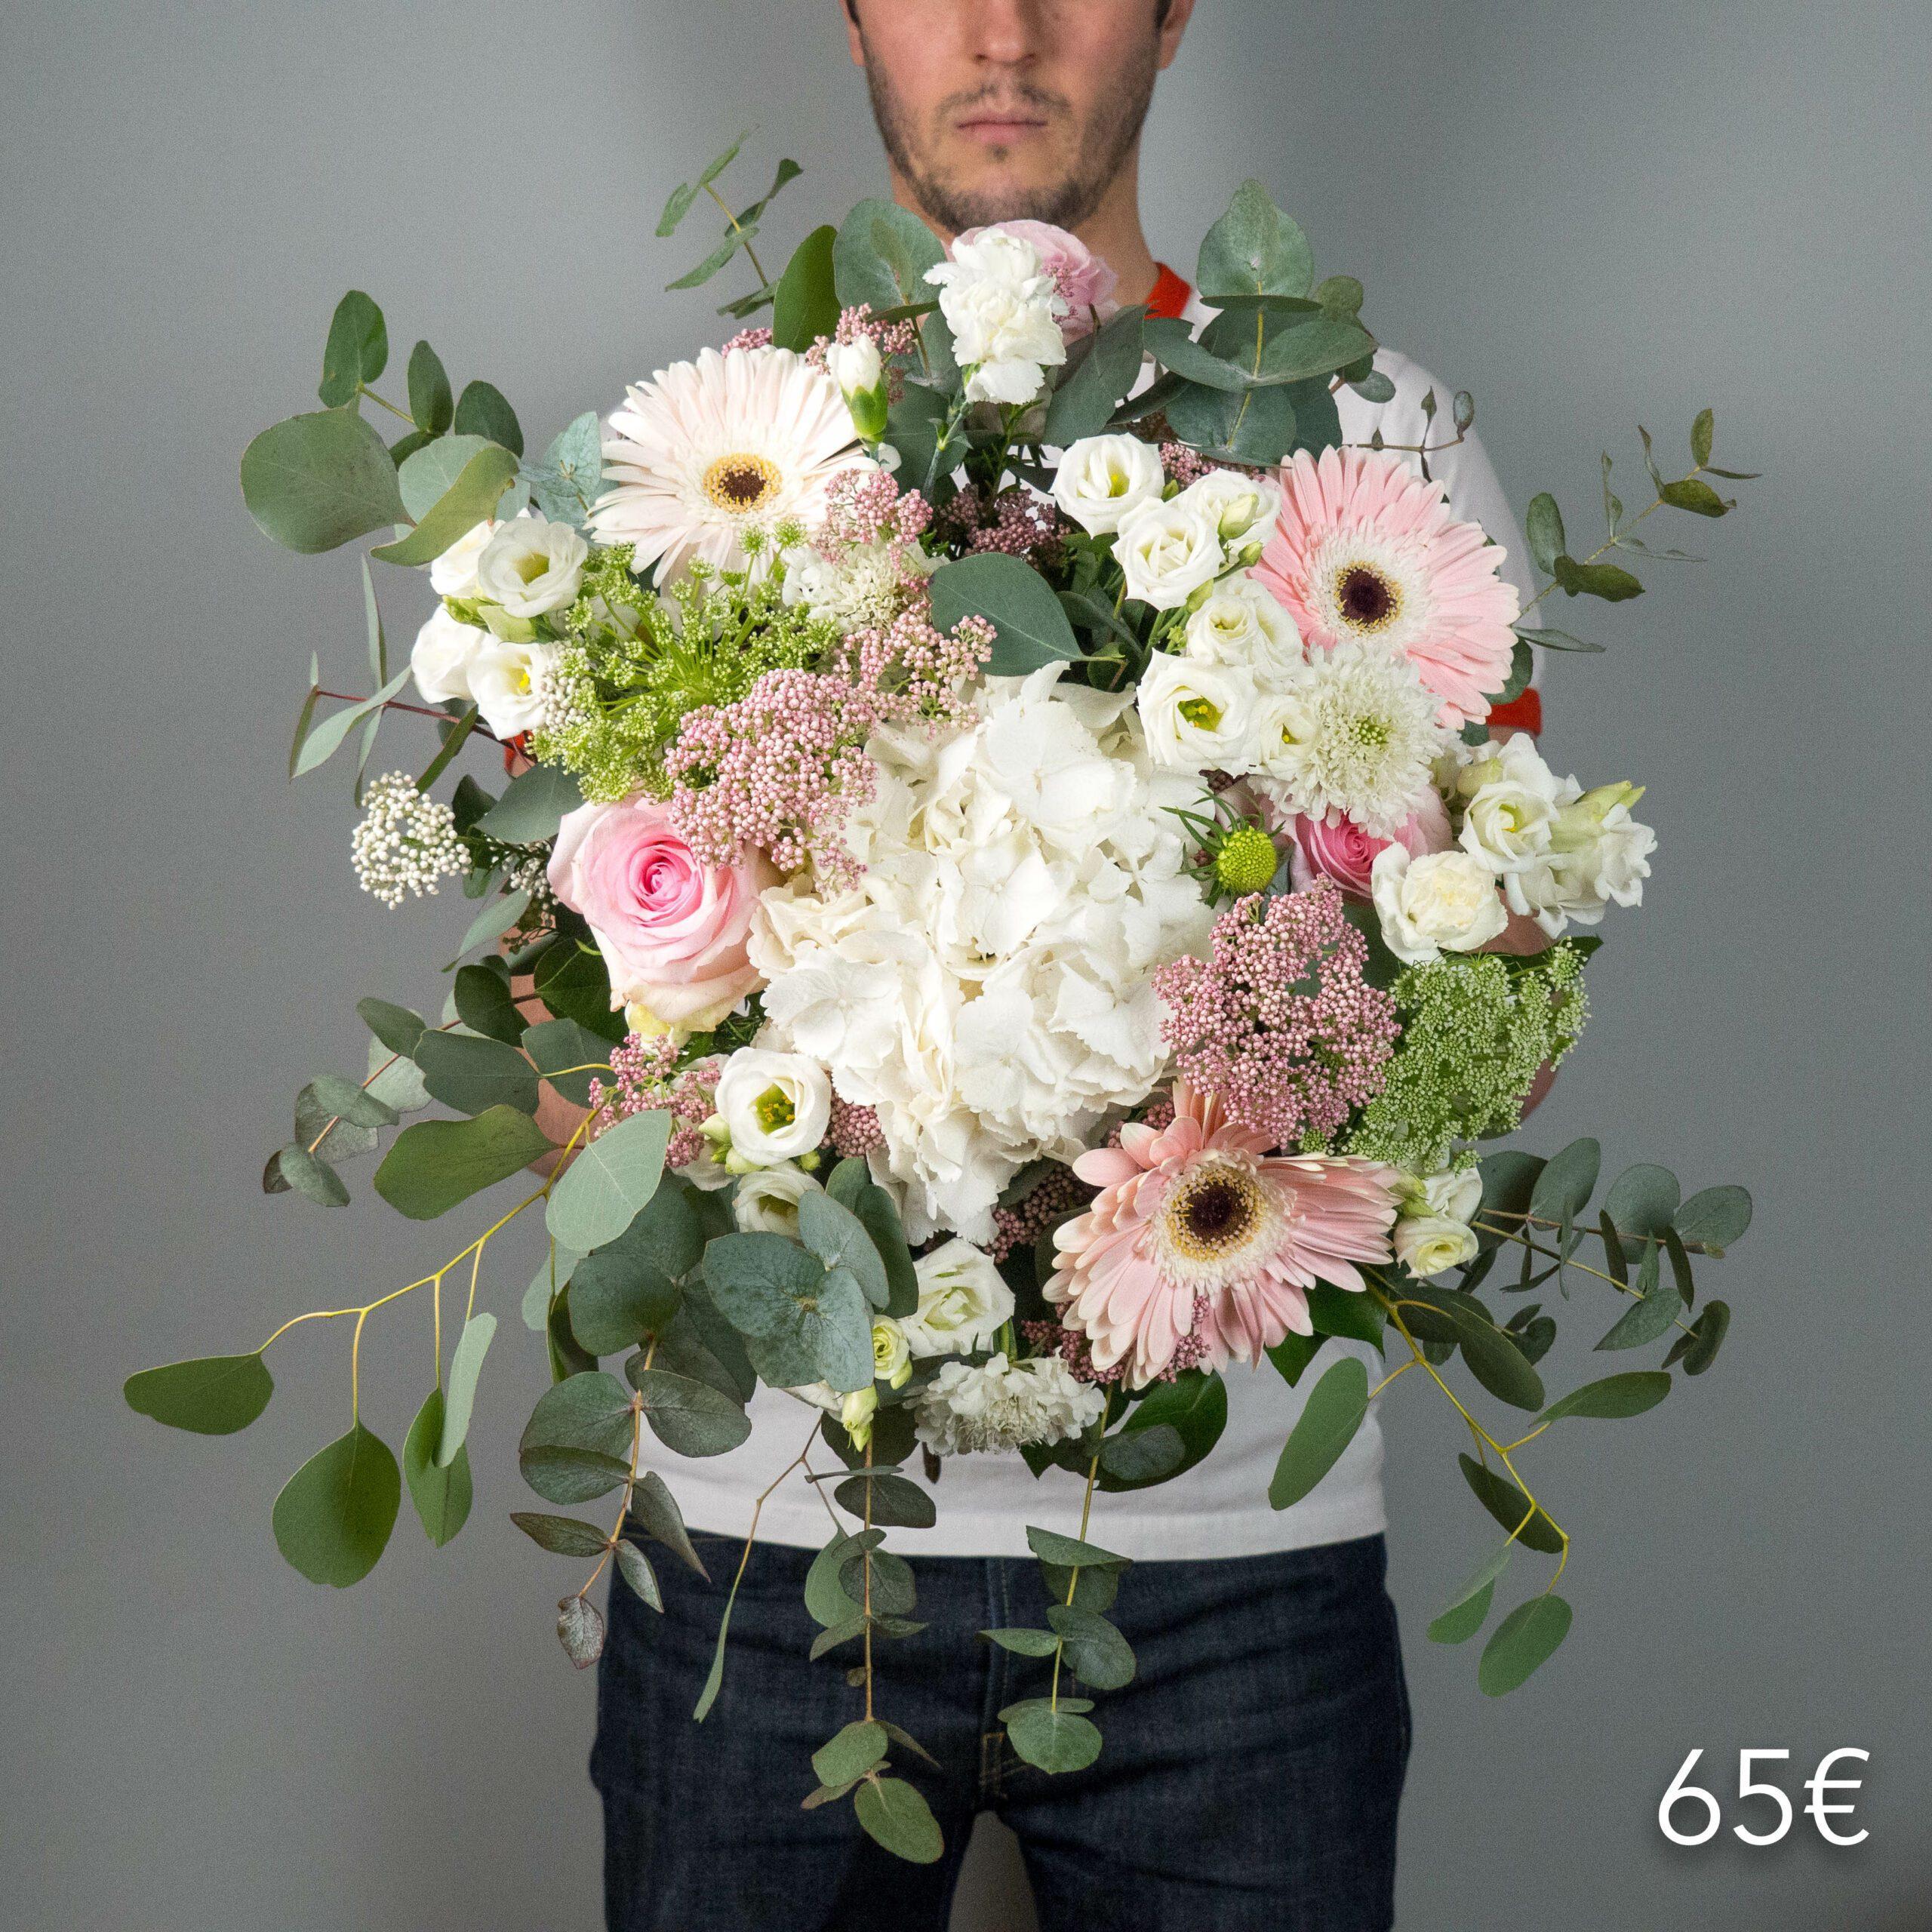 2_bouquet-fleurs-tendresse-65